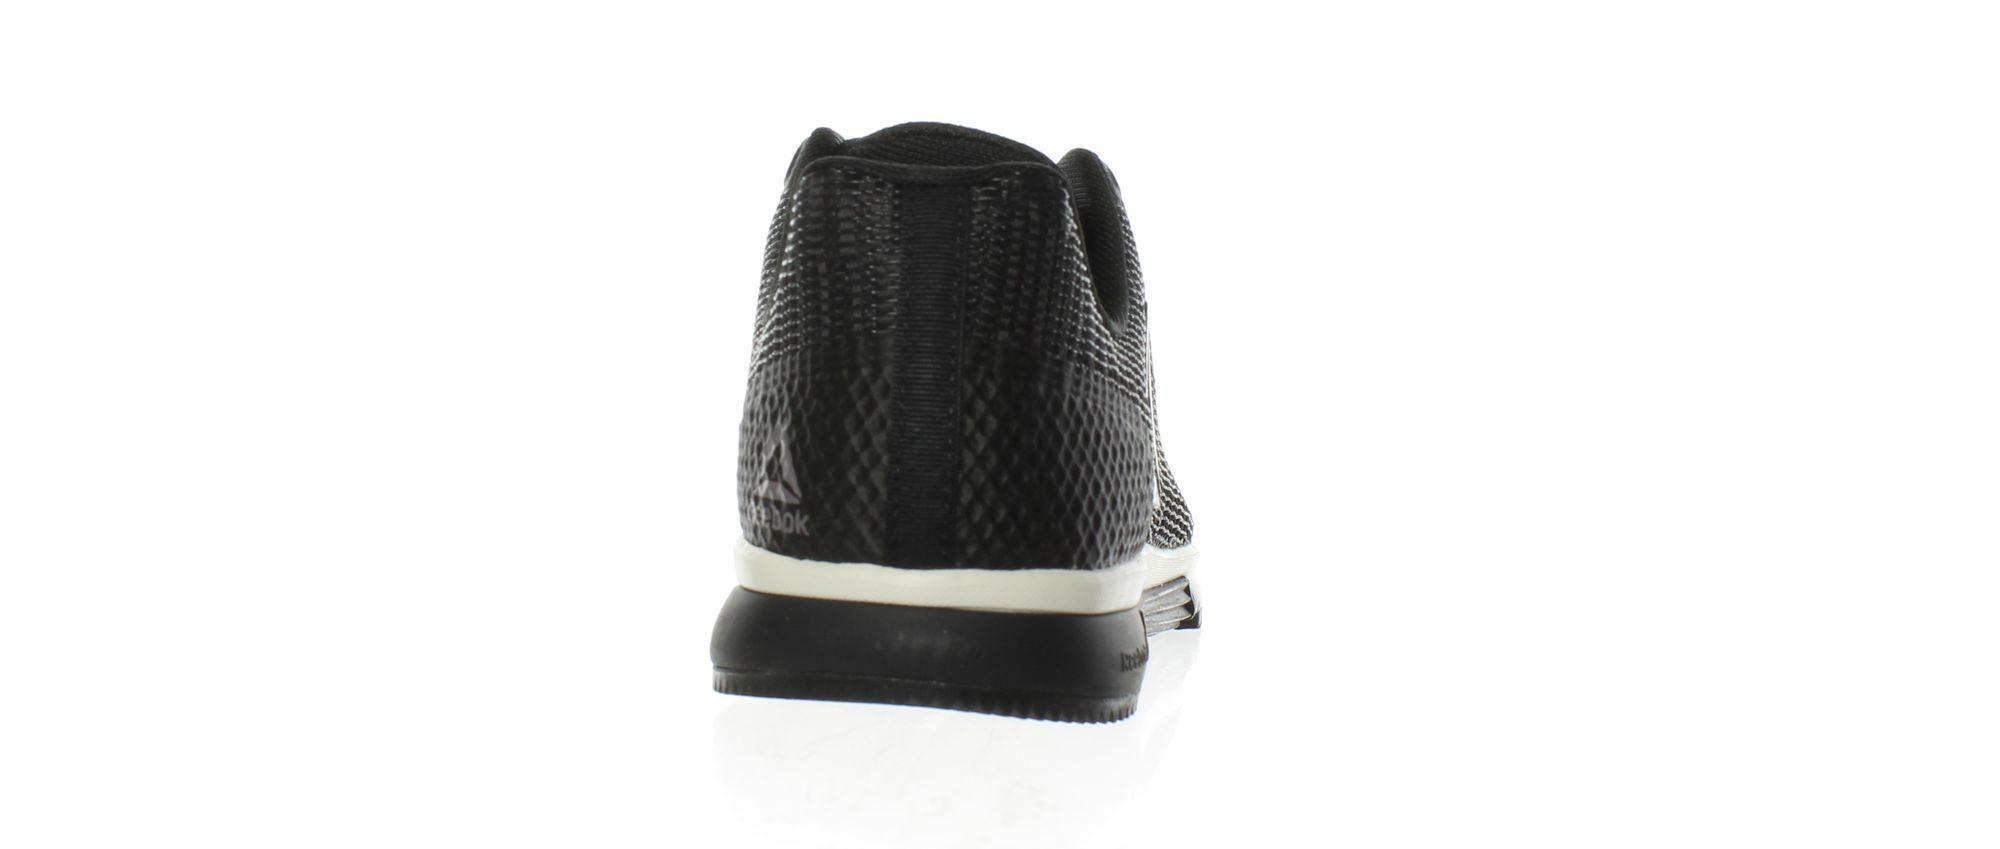 Reebok-Mens-Athletic-Speed-TR-Flexweave-Cross-Training-Shoes thumbnail 20